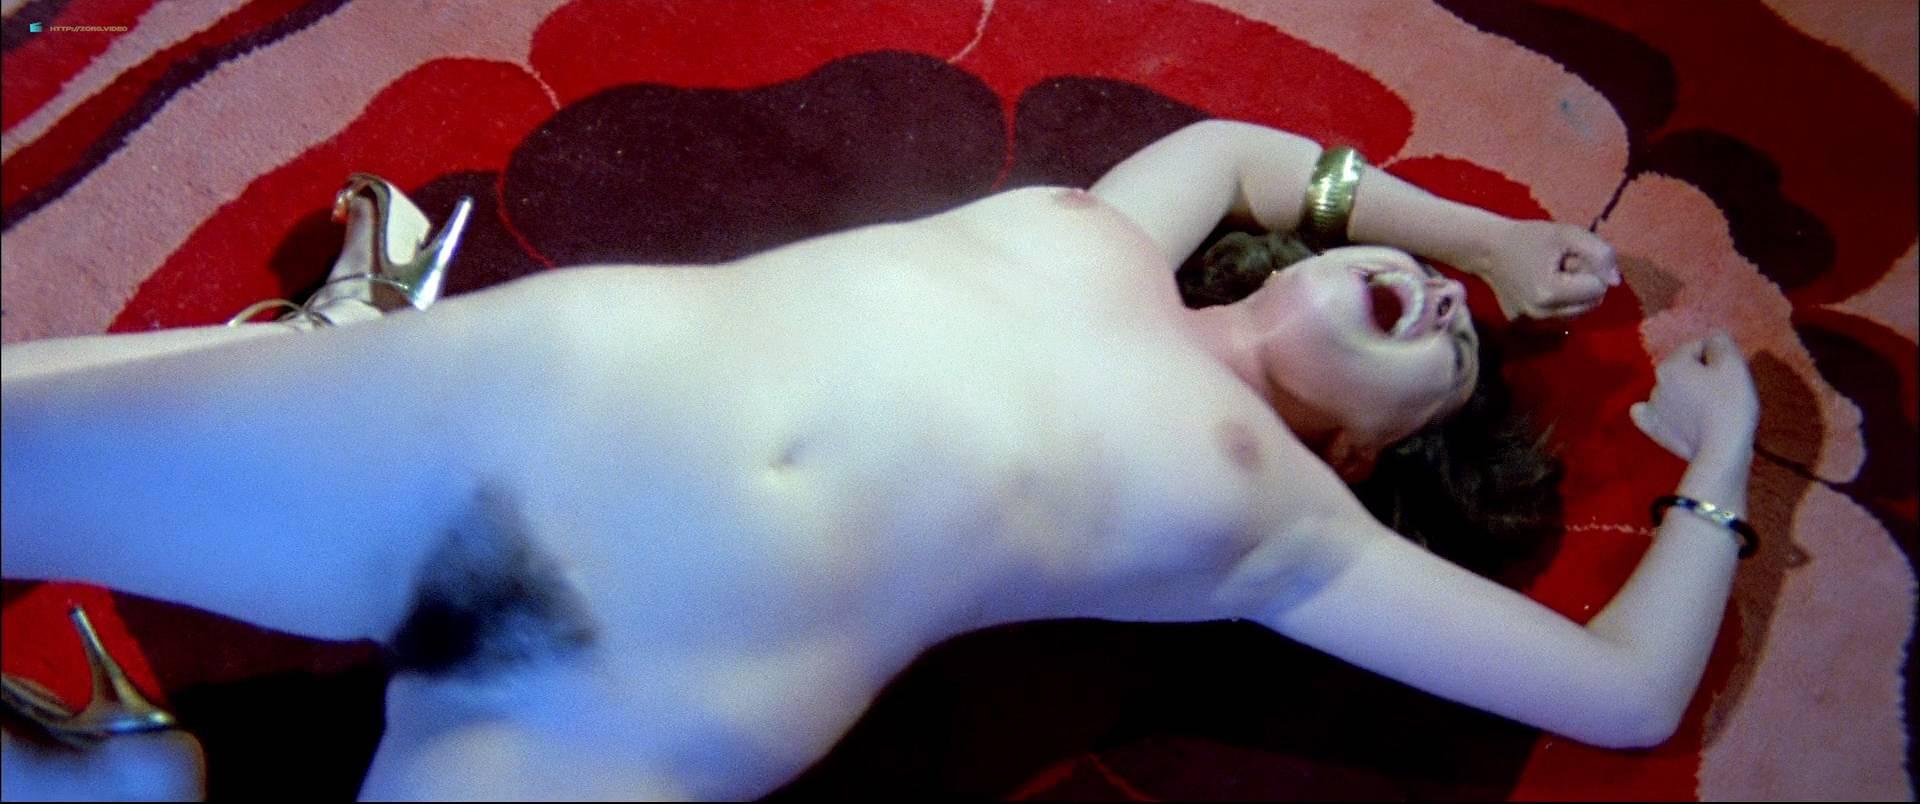 Lina Romay nude full frontal Mari Carmen Nieto, Alicia Príncipe nude too - Night of 1,000 Sexes (SP-1984) HD 1080p BluRay (12)